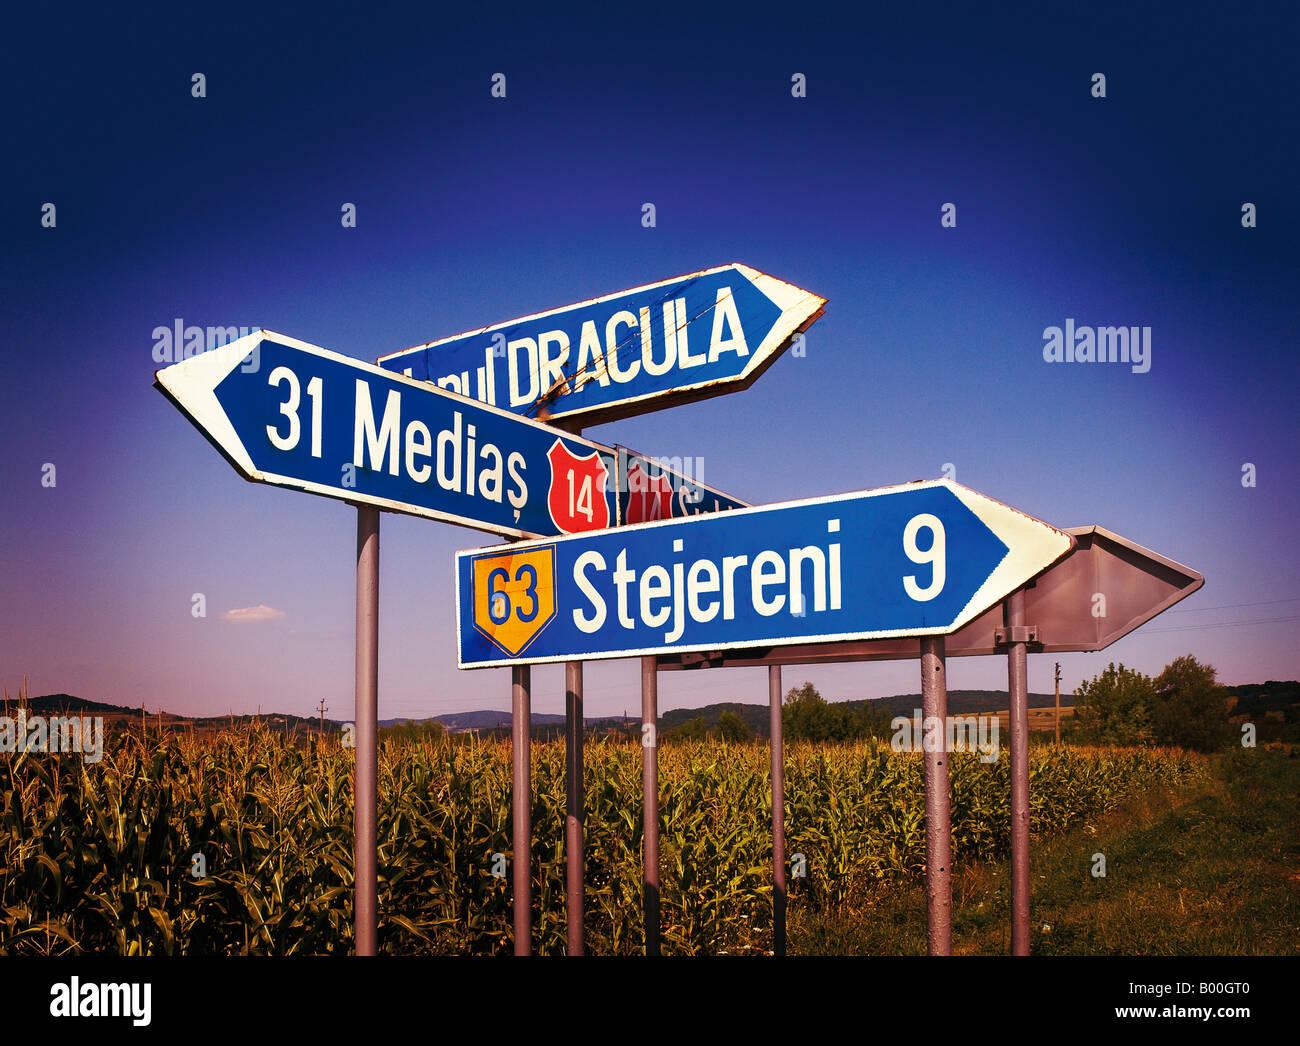 TRAFFIC SIGNS. TRANSYLVANIA. ROMANIA Stock Photo